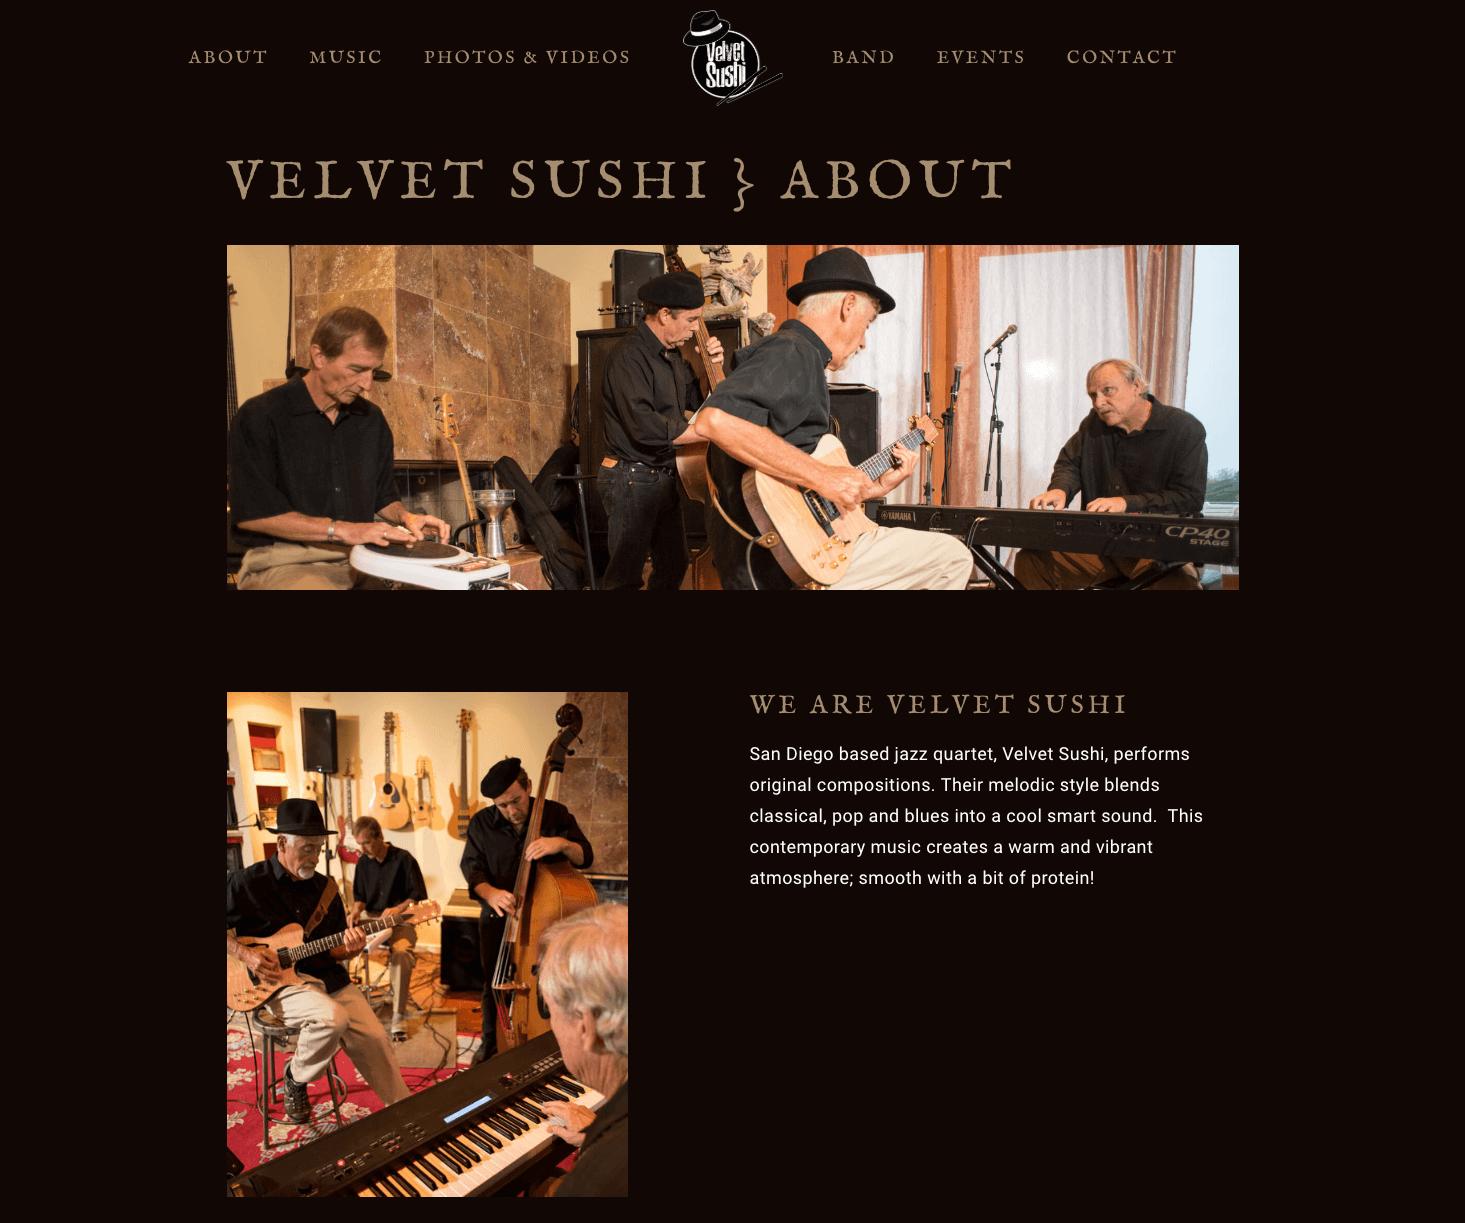 Velvet-Sushi-Jazz-Band-Website-Design-About-Page